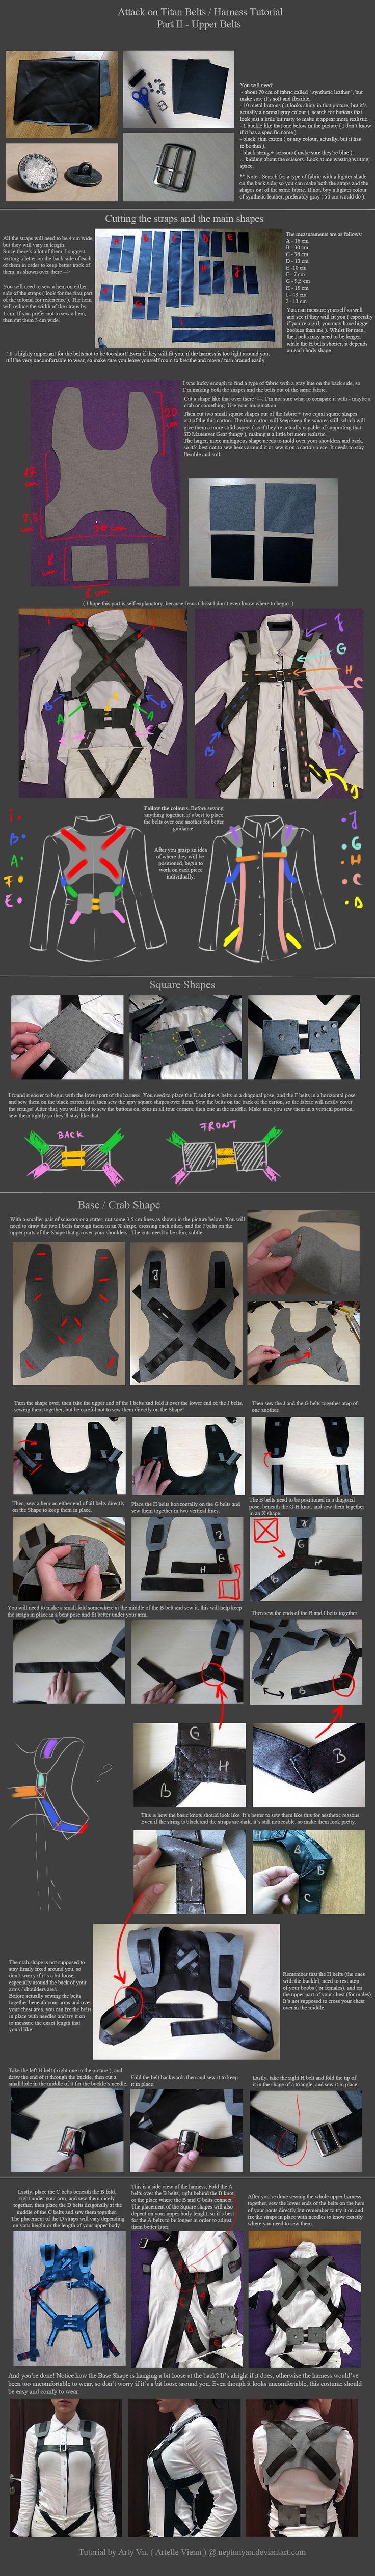 Attack on Titan Belts / Harness tutorial - Part 2 by neptunyan.deviantart.com on @deviantART